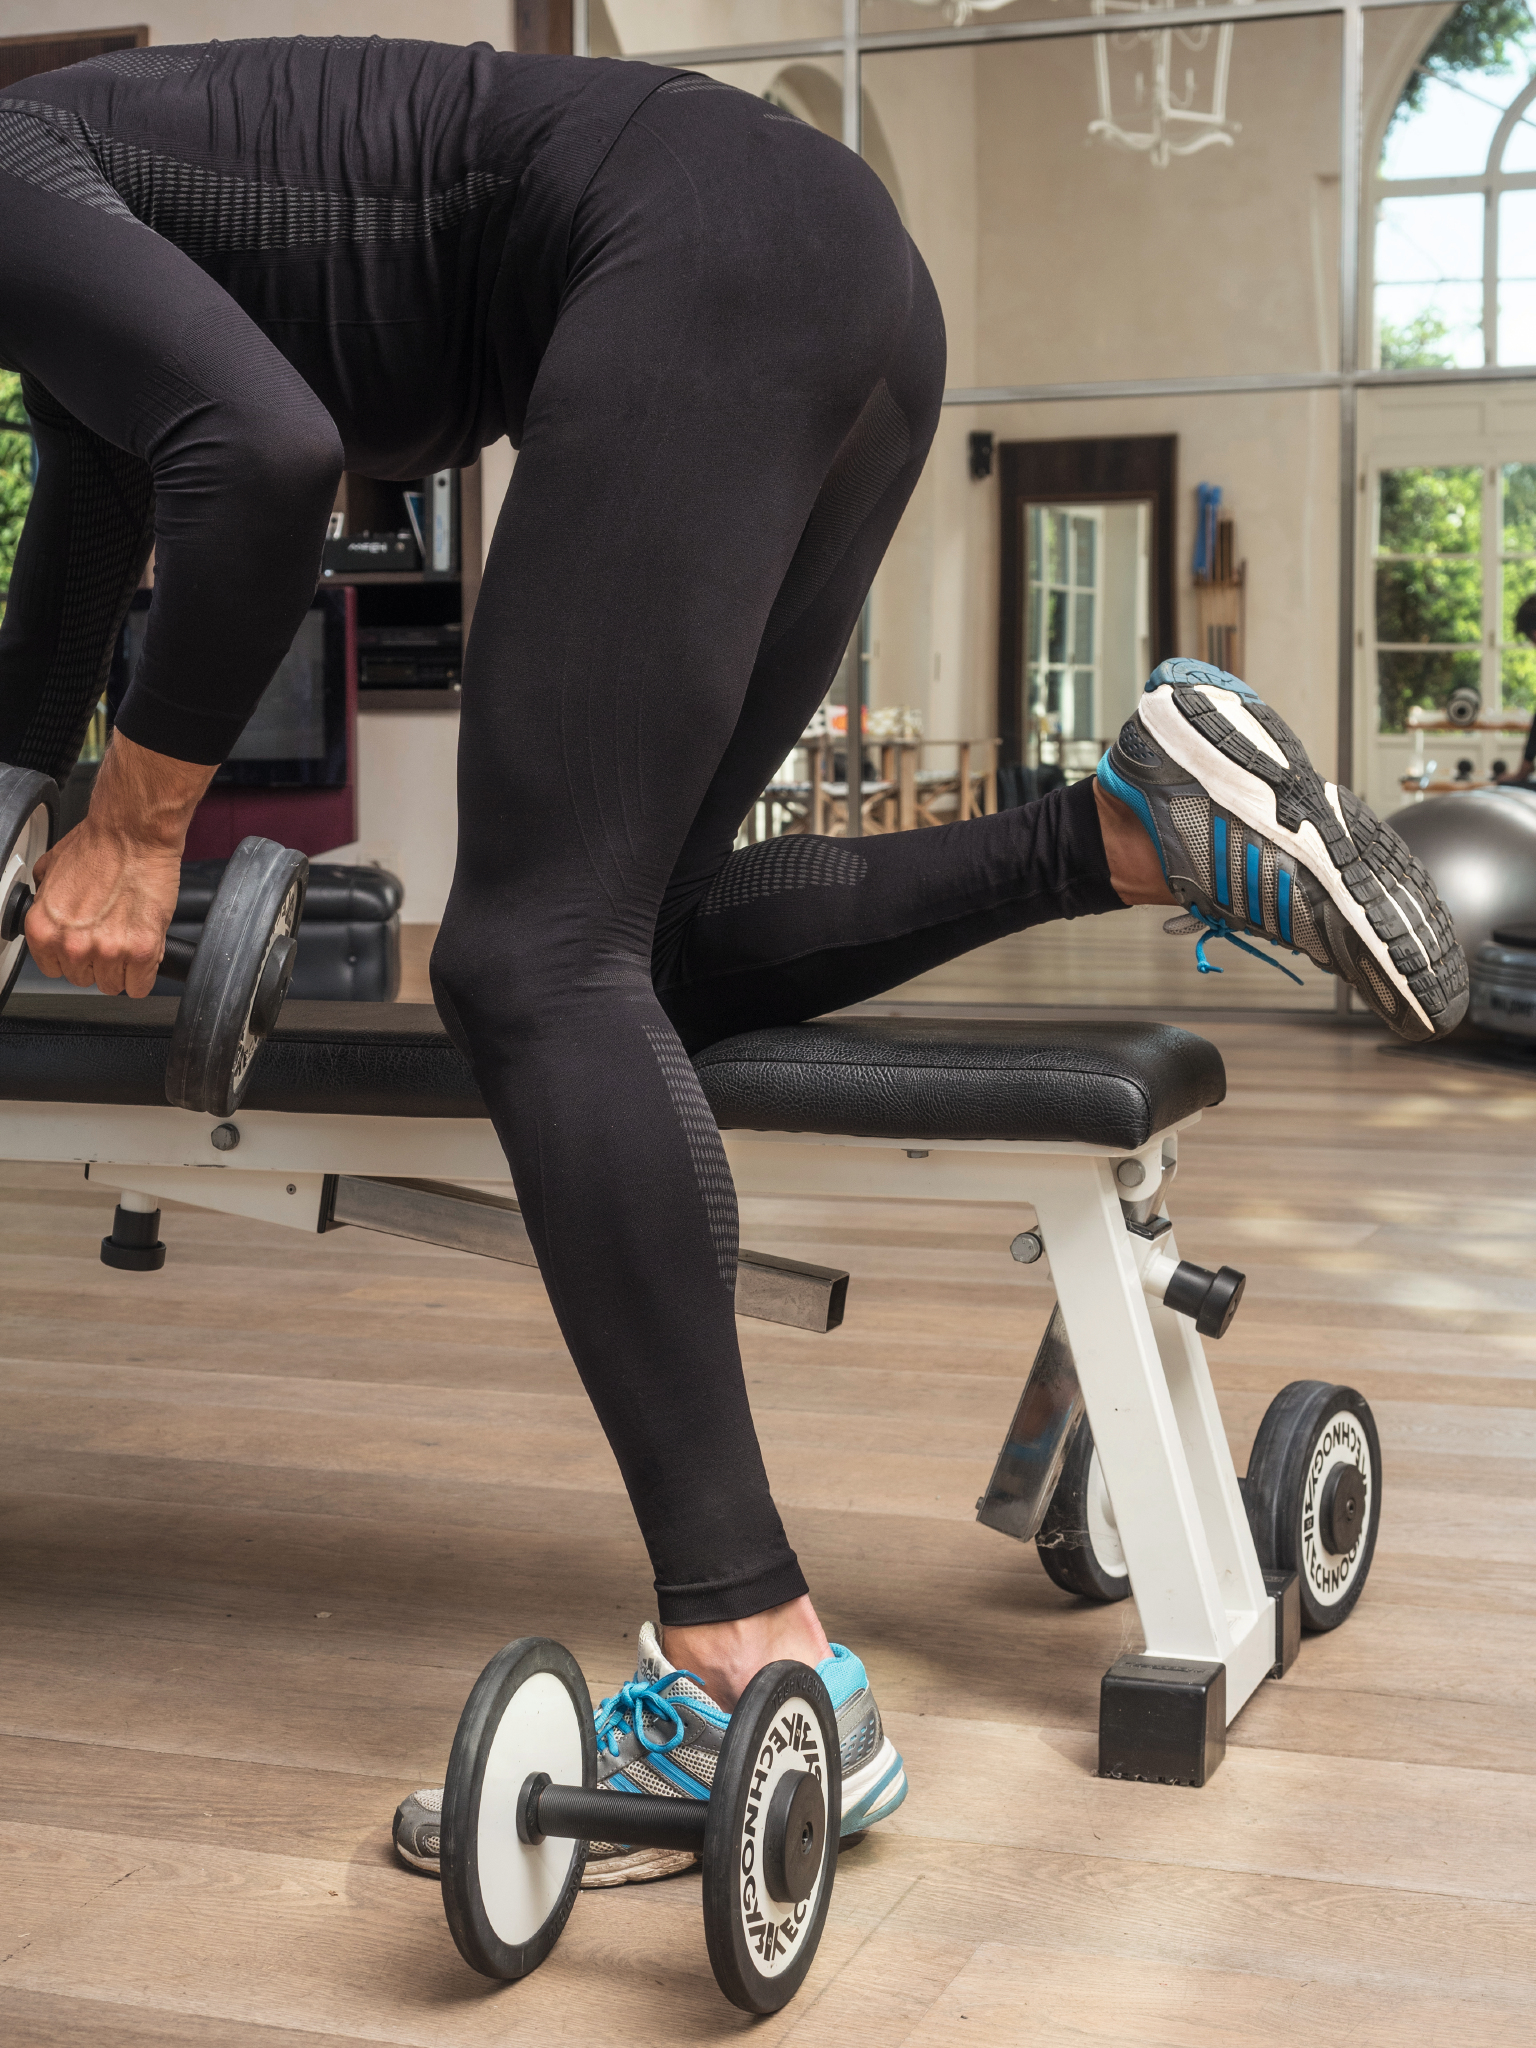 Issimo-Men-039-s-Sports-Stretchy-Leggings-Moisture-Wicking-Training-Pants thumbnail 7